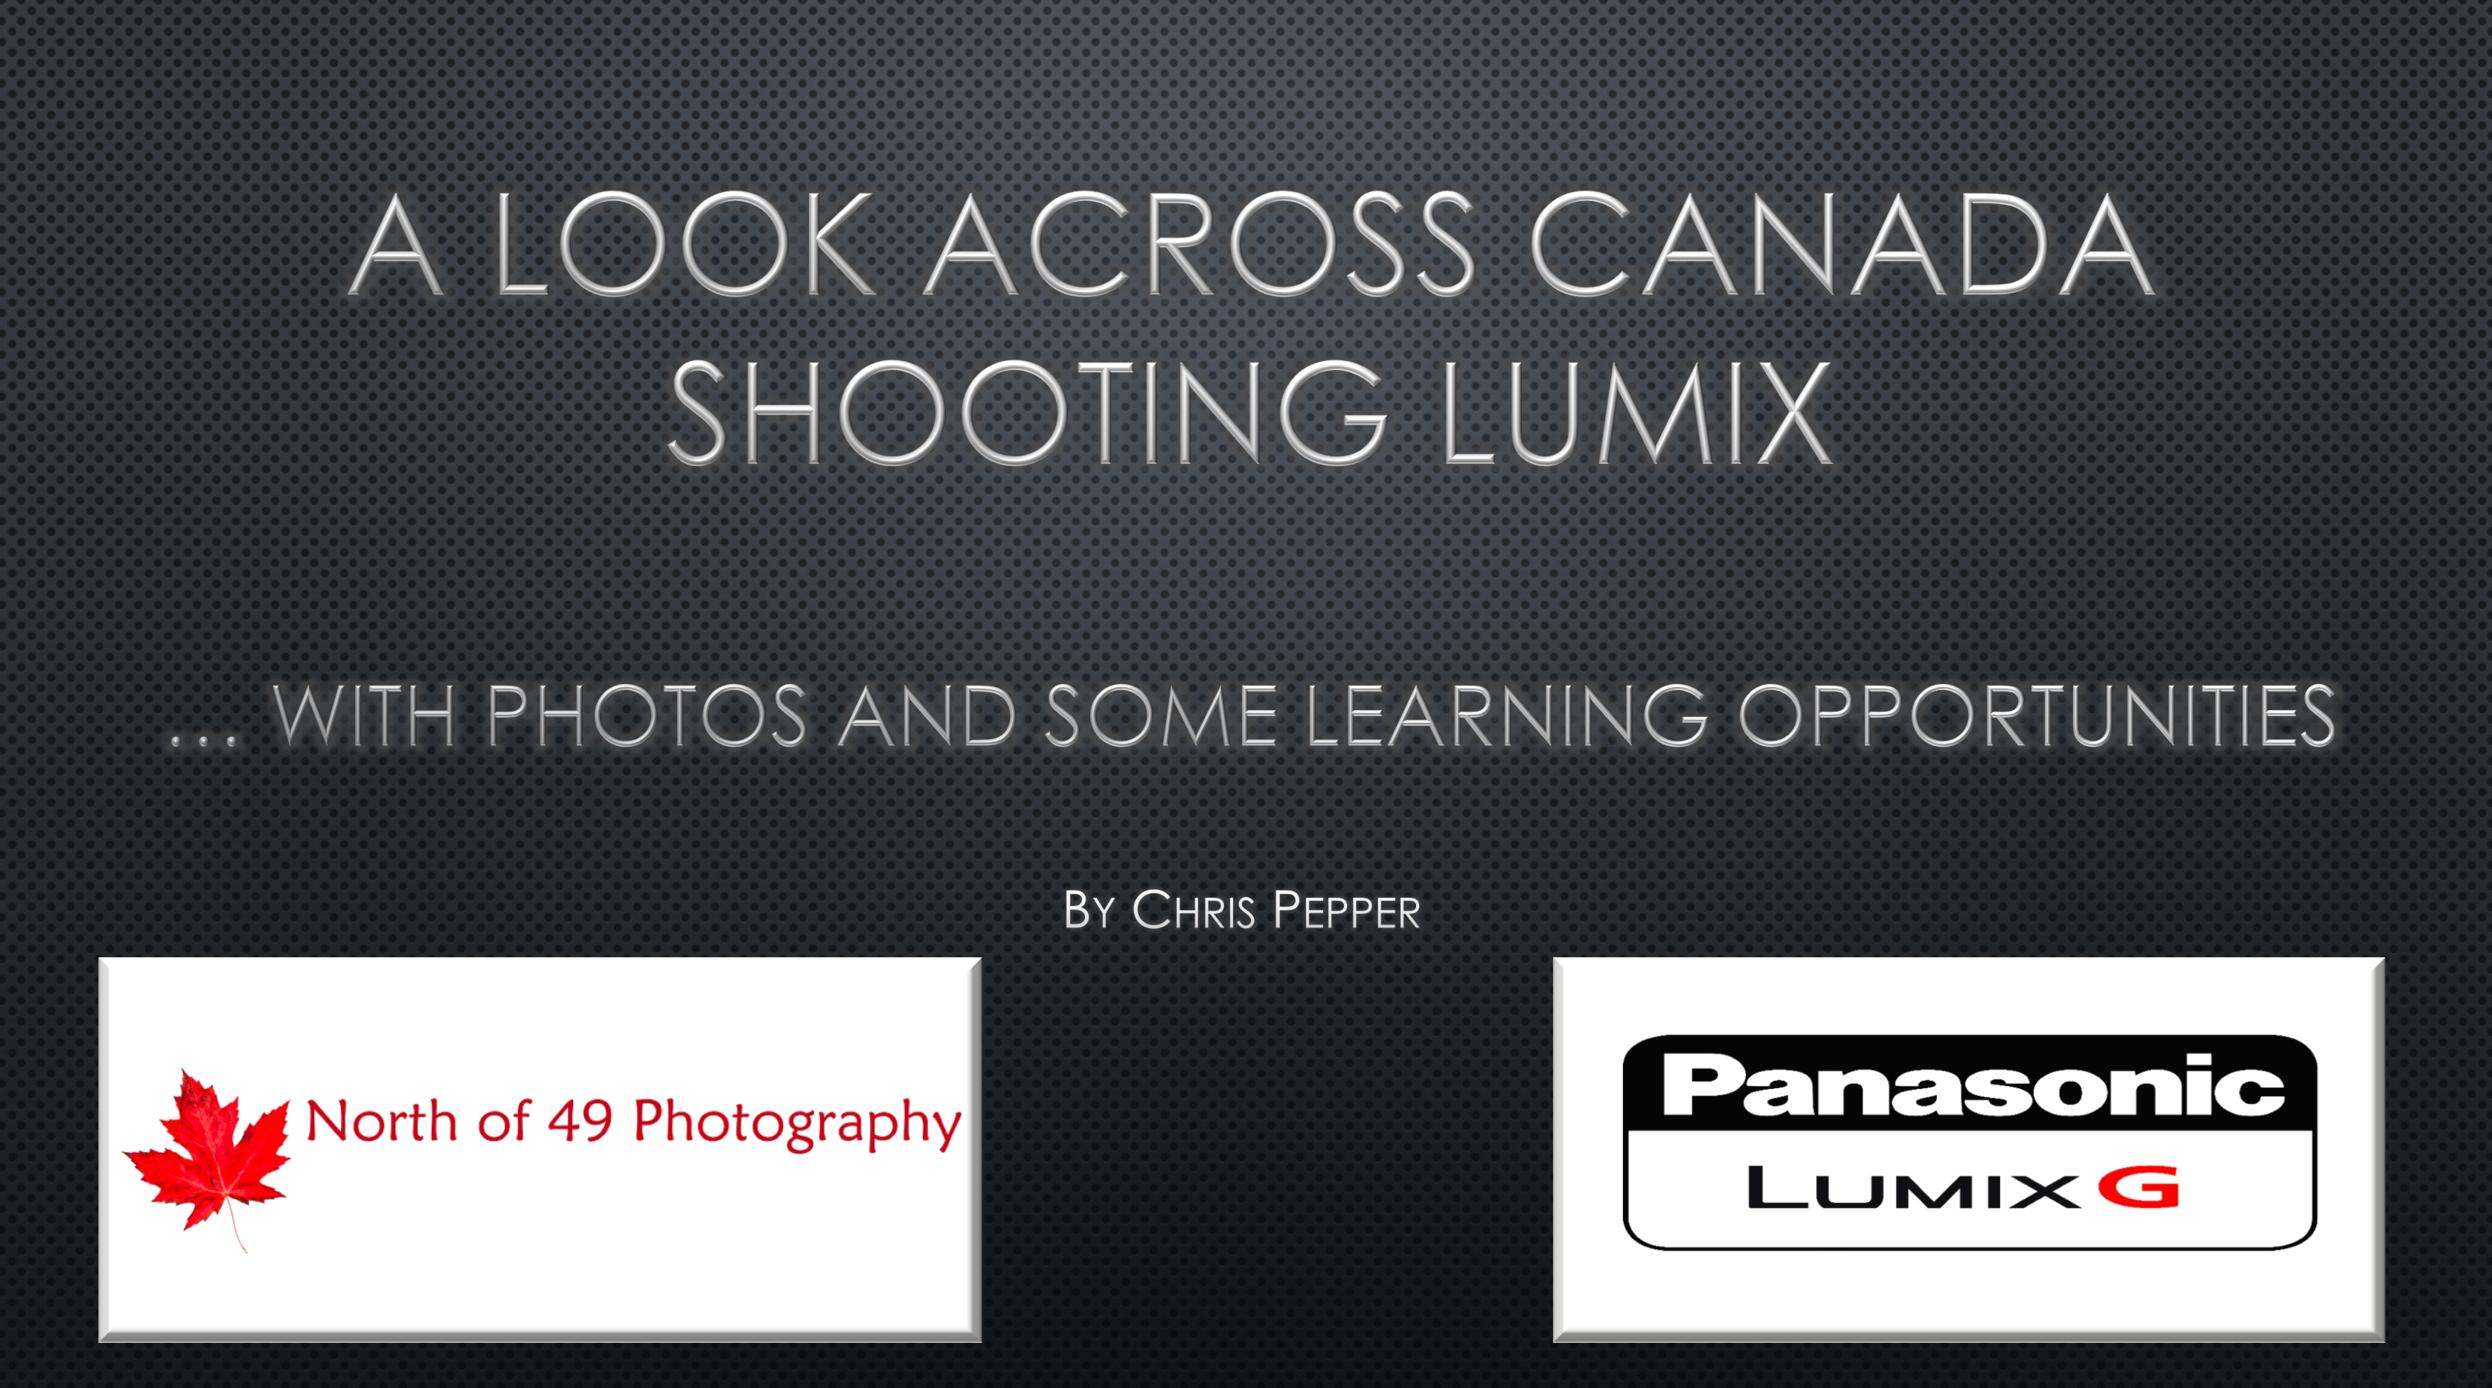 A Look Across Canada shooting Lumix With Canadian Lumix Storyteller Chris Pepper